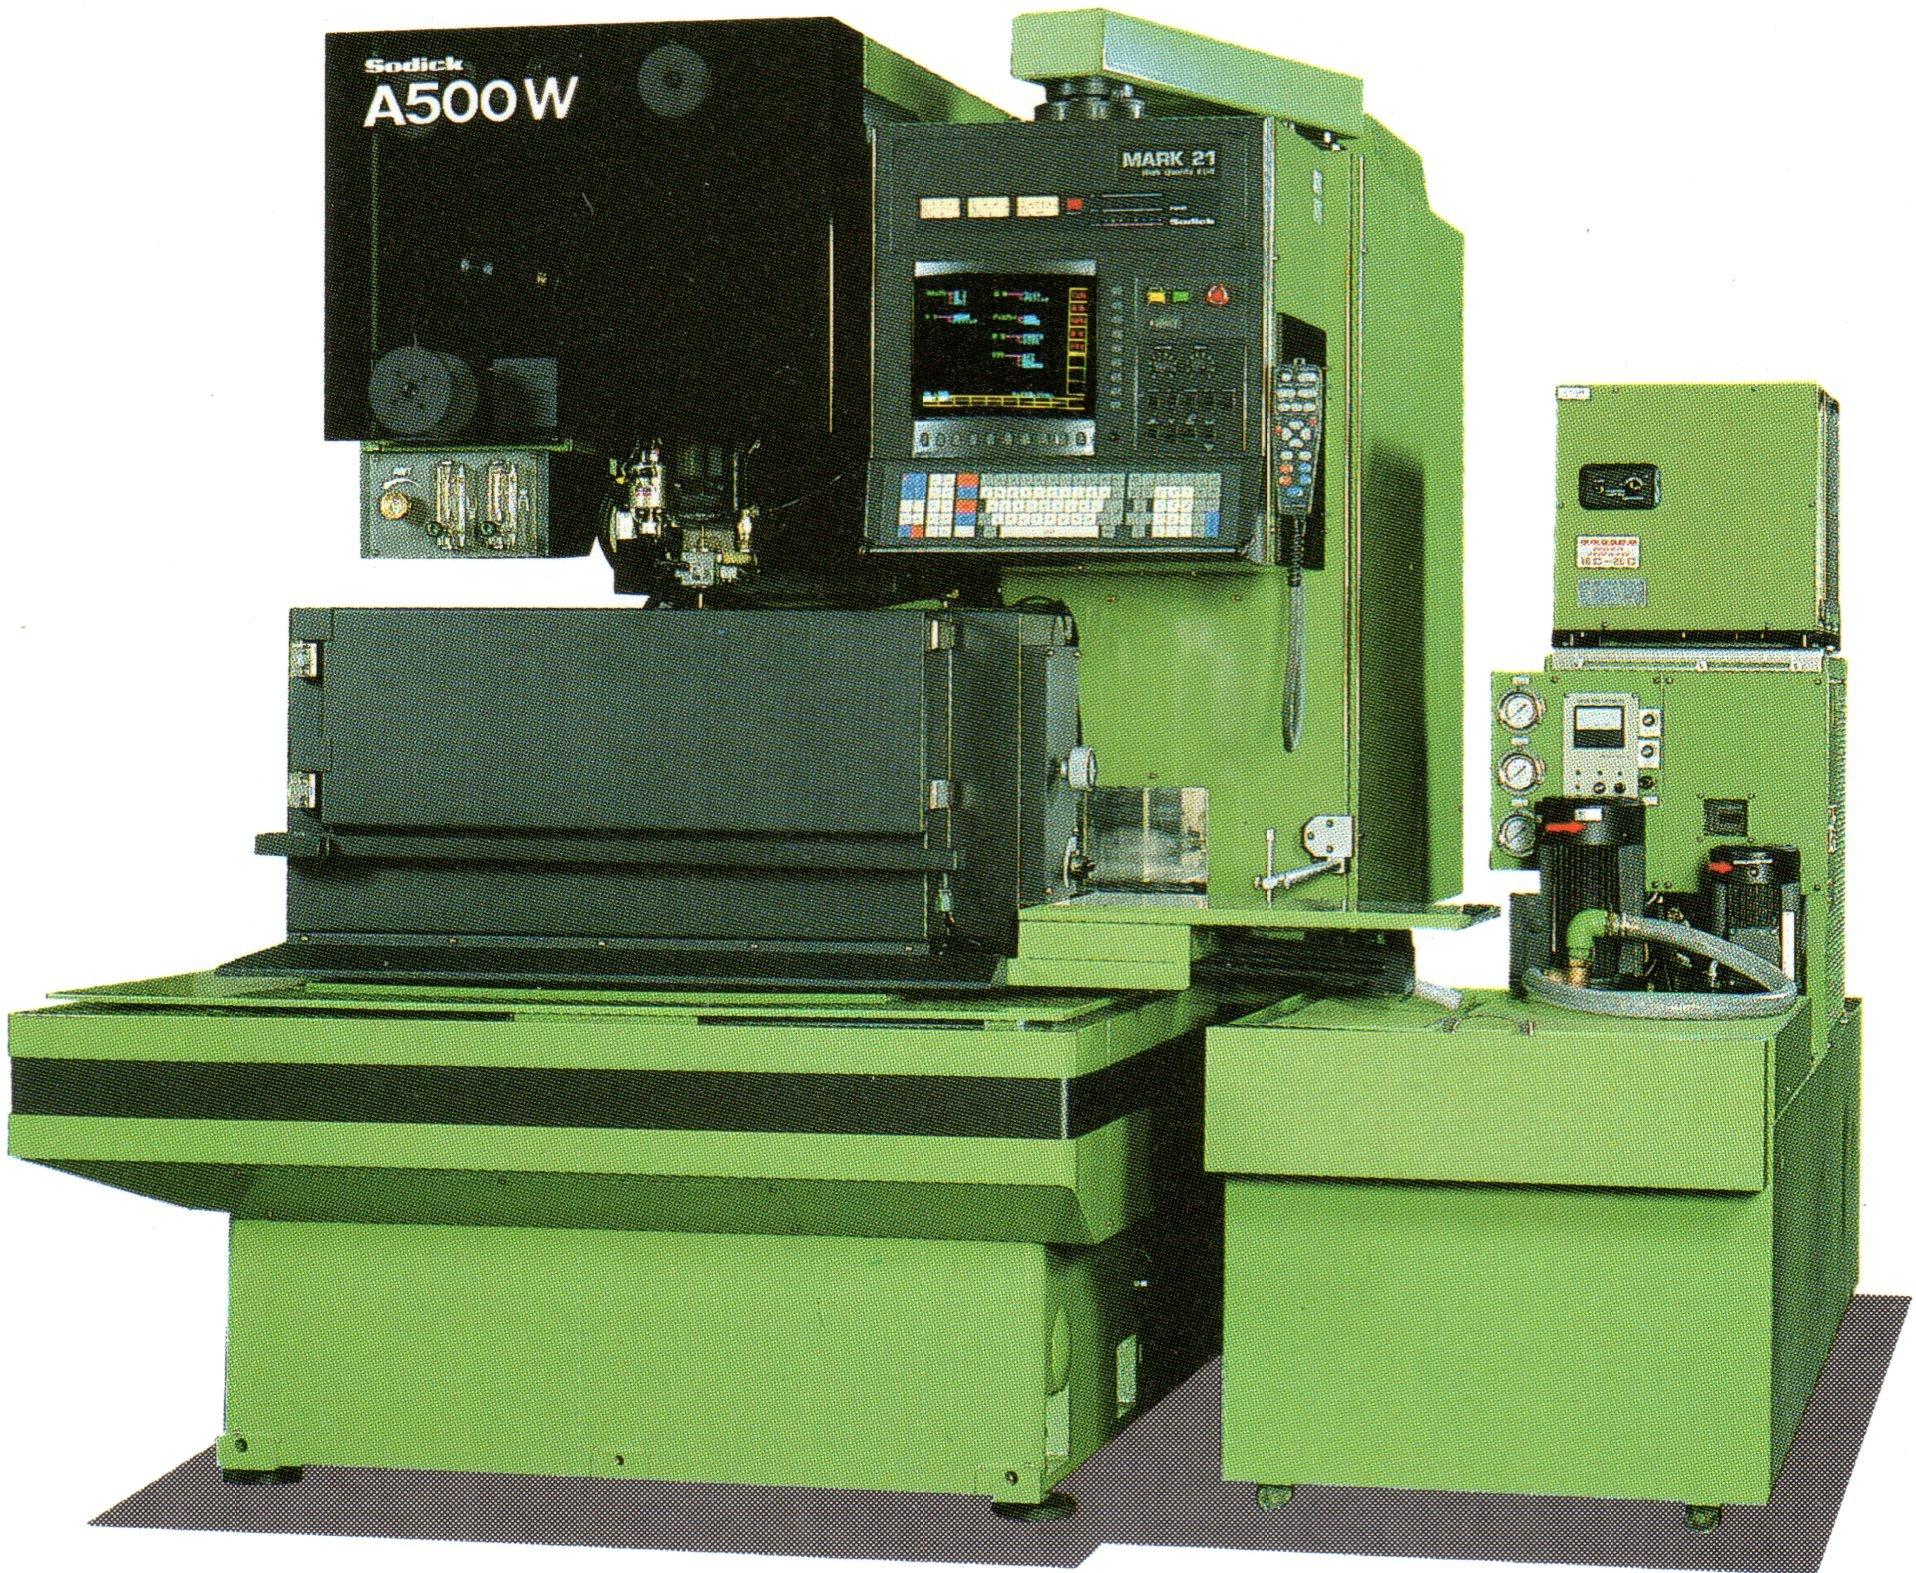 Sodick A500W AWT 5 axis WEDM MK25 Controller